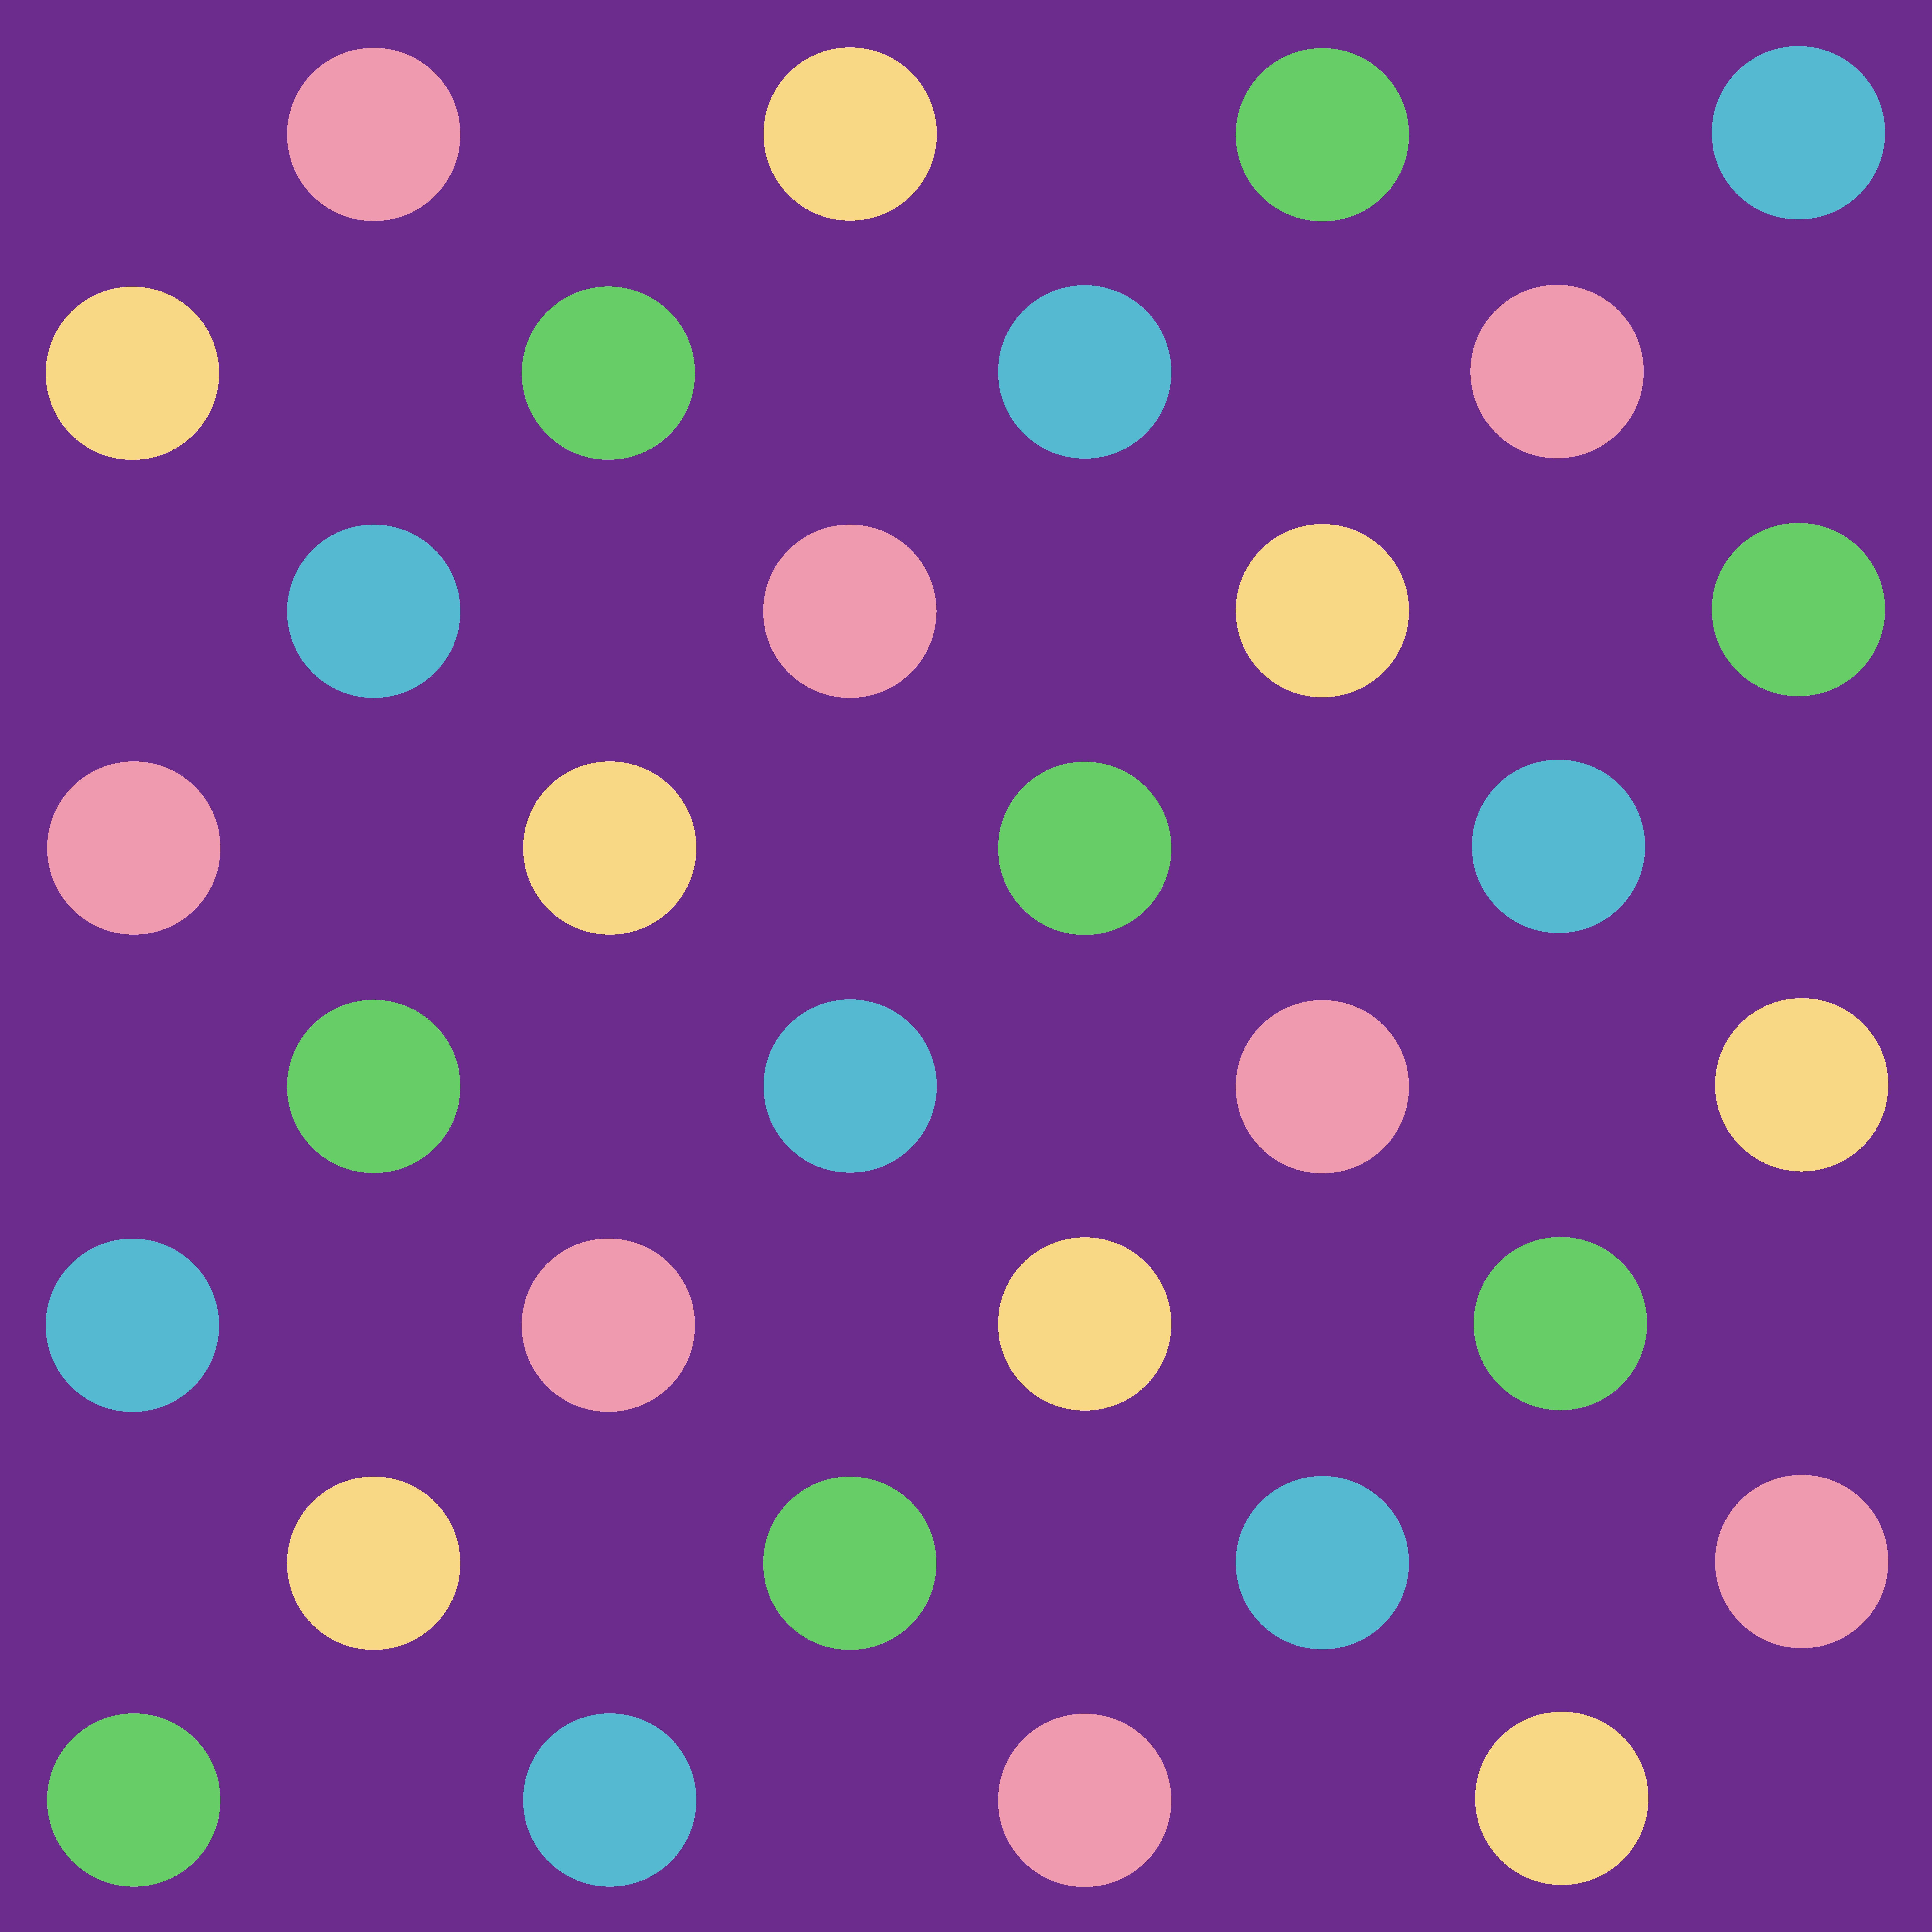 Cute Colorful Polka Dots Pattern.